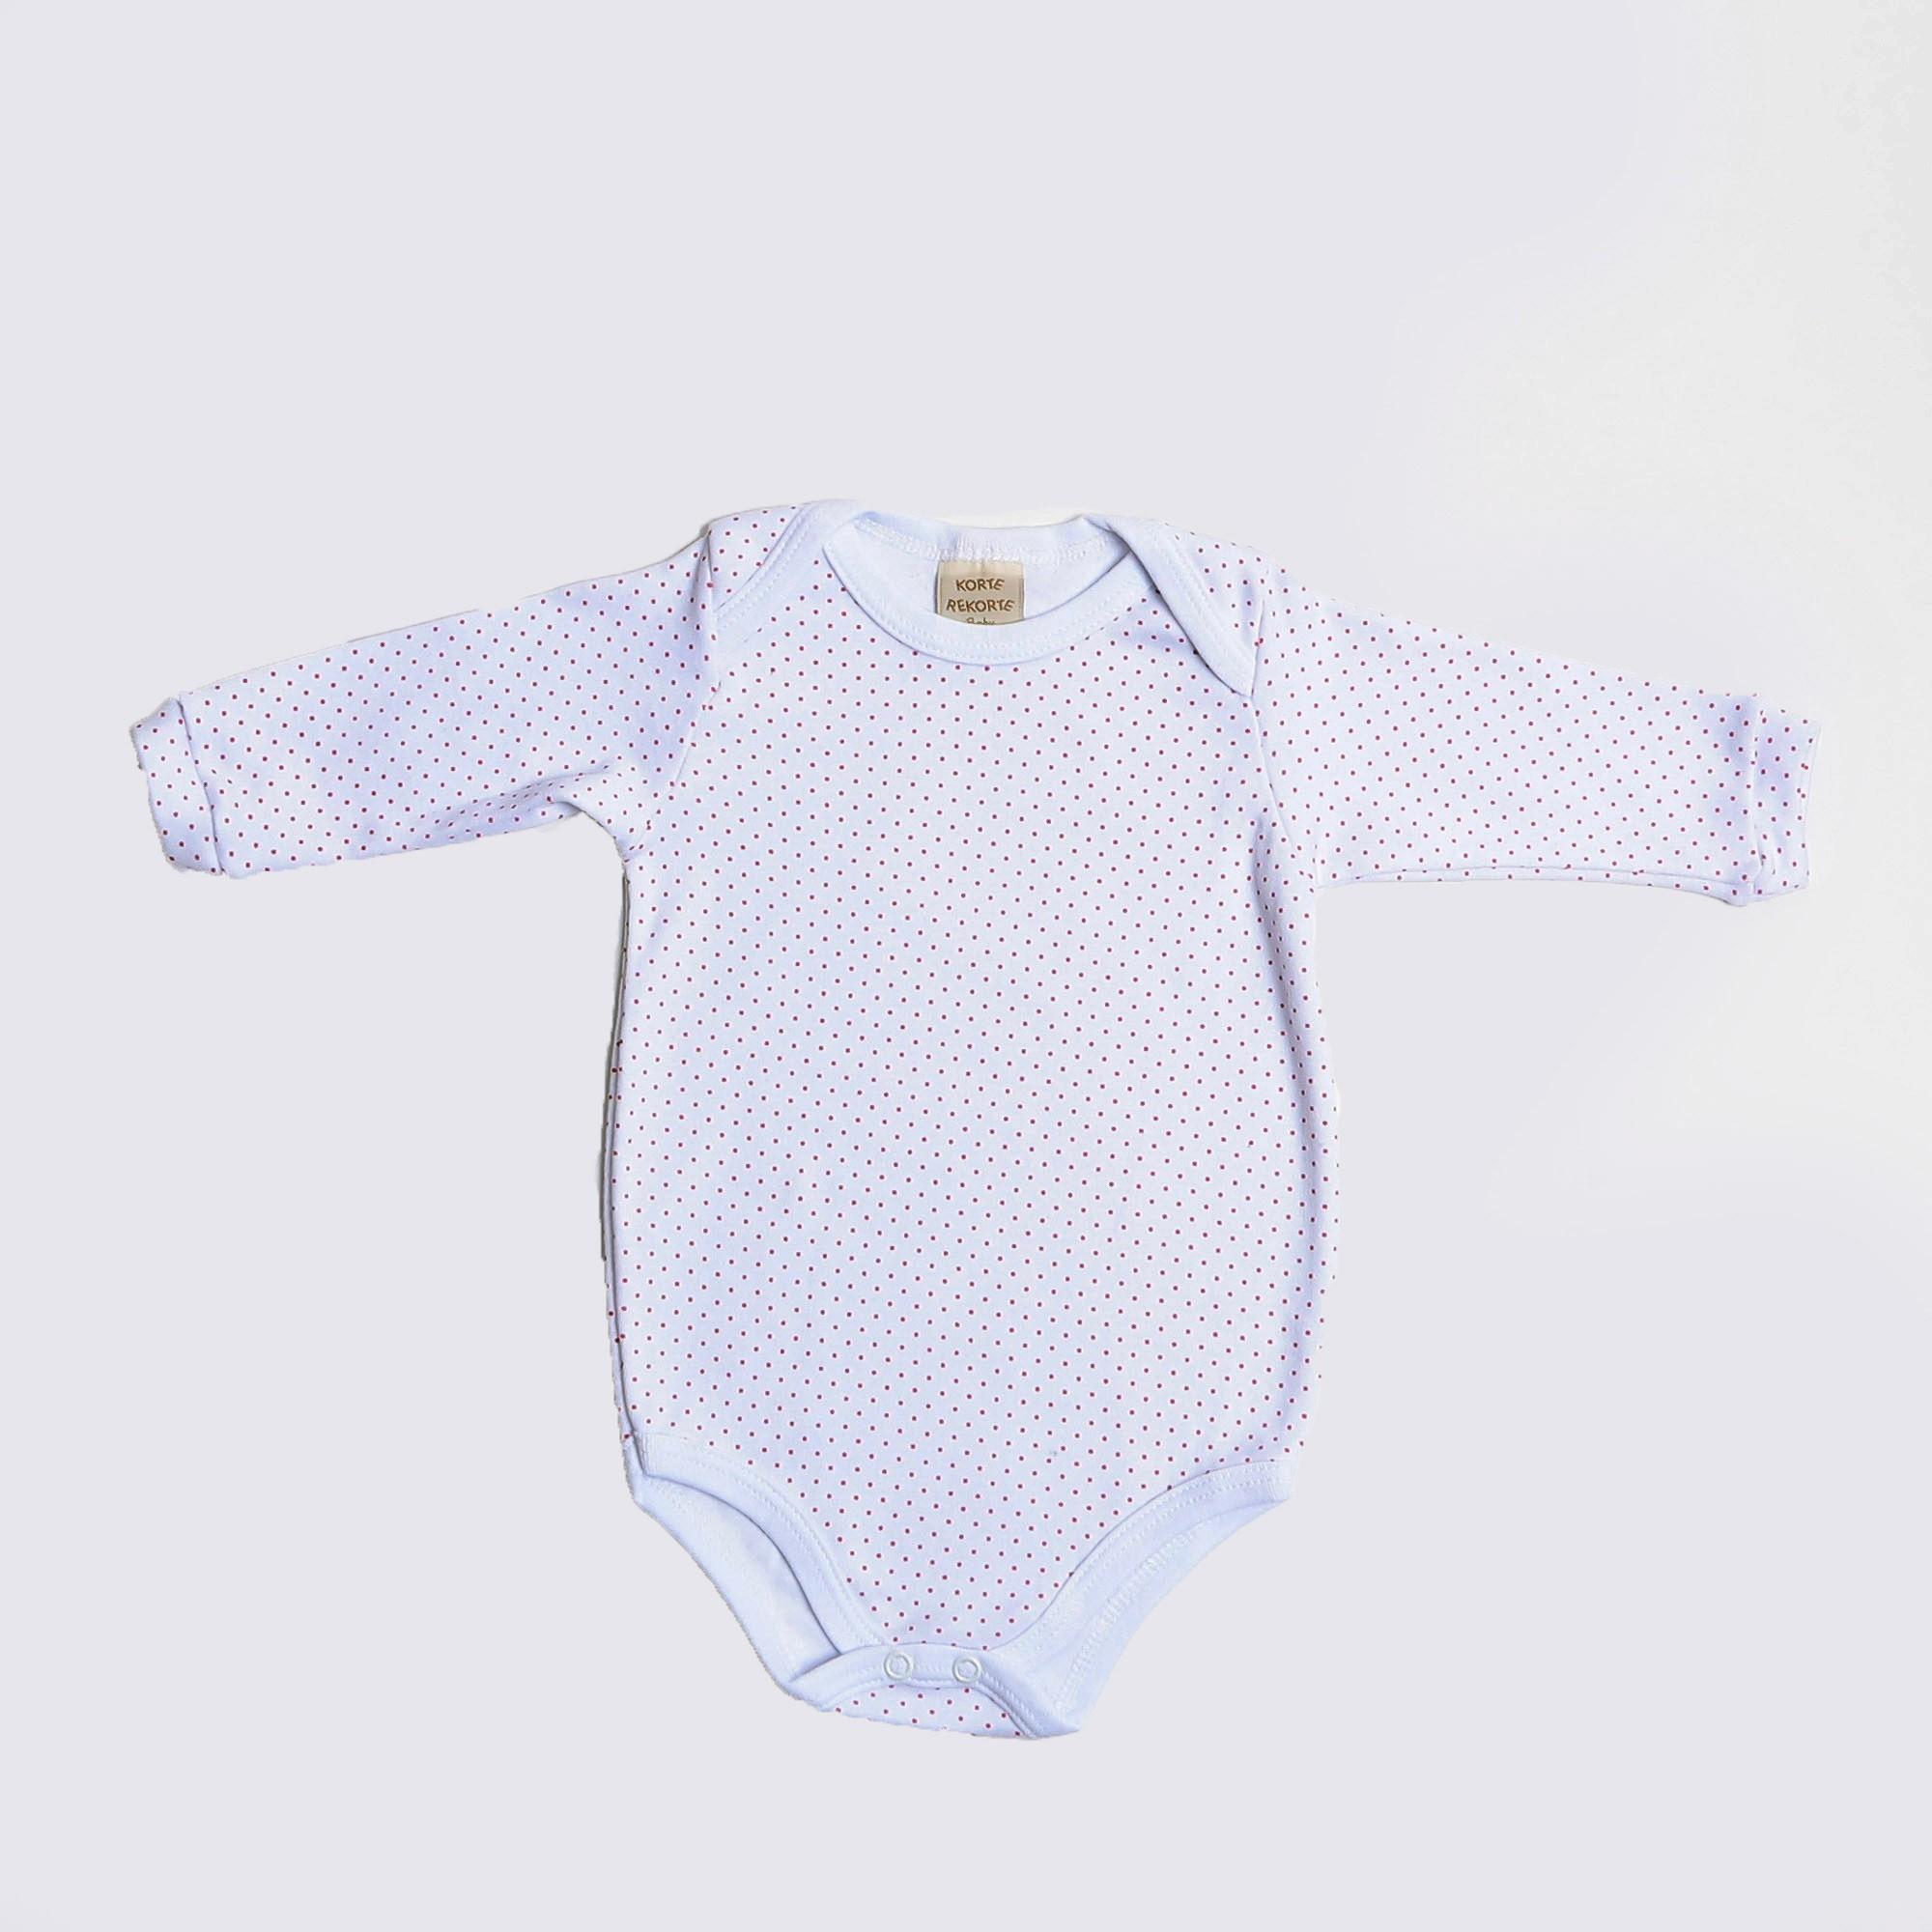 Body De Bebê Manga Longa Branco Com Poá - Korte Rekorte